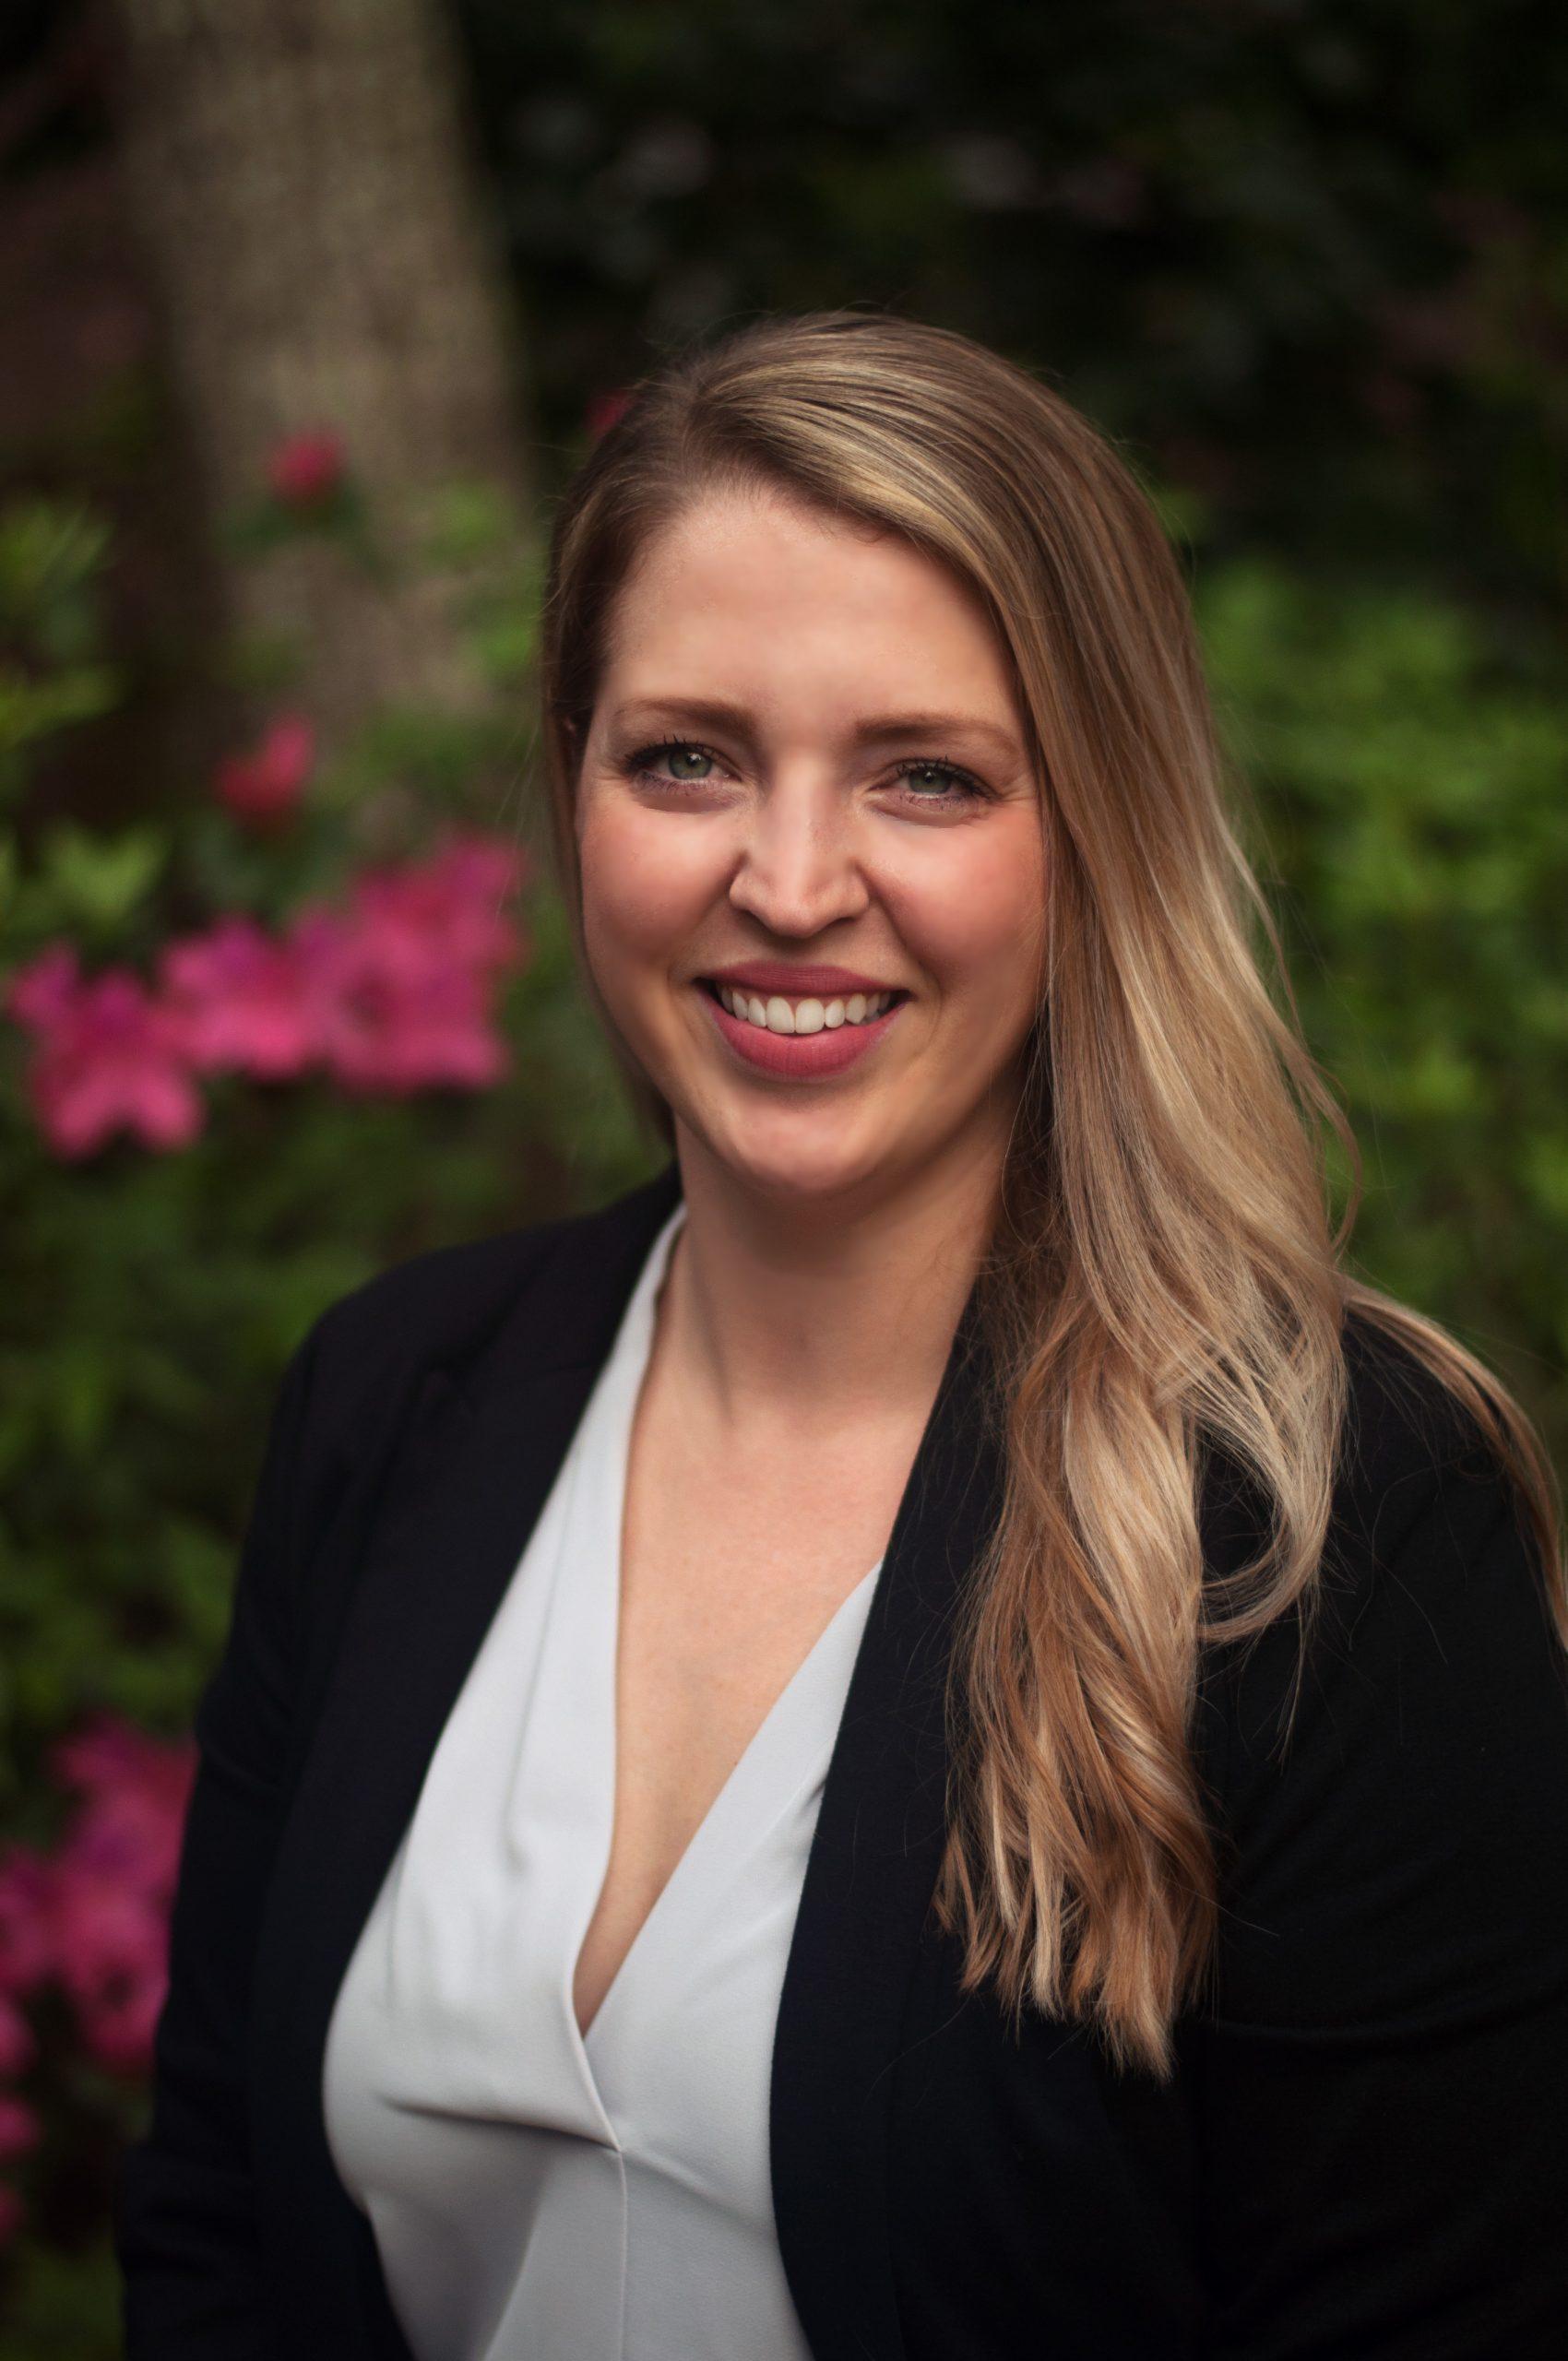 Samantha Persell headshot